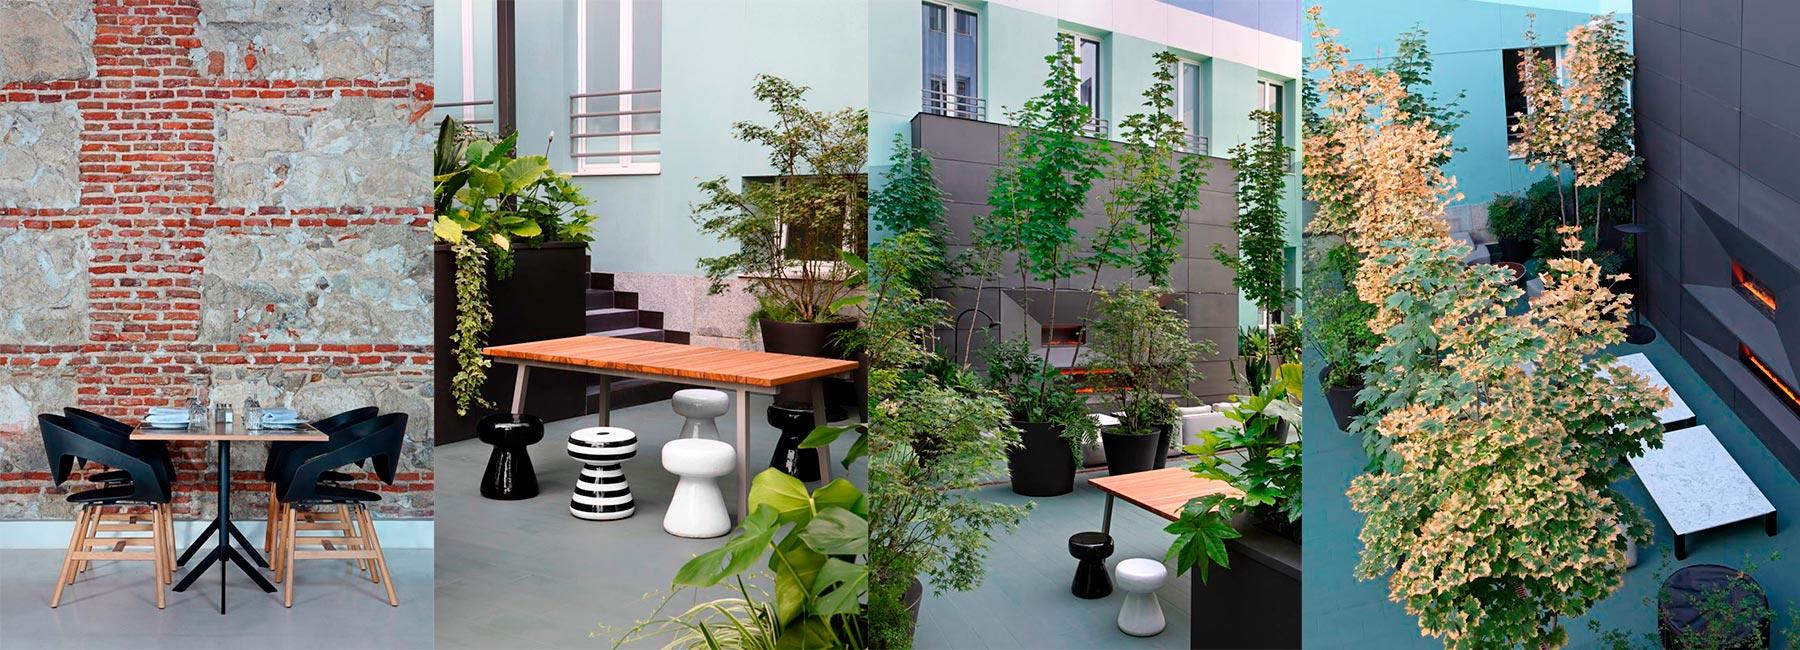 Отель Petit Palace Santa Barbara по проекту Teresa Sapey Studio, Мадрид